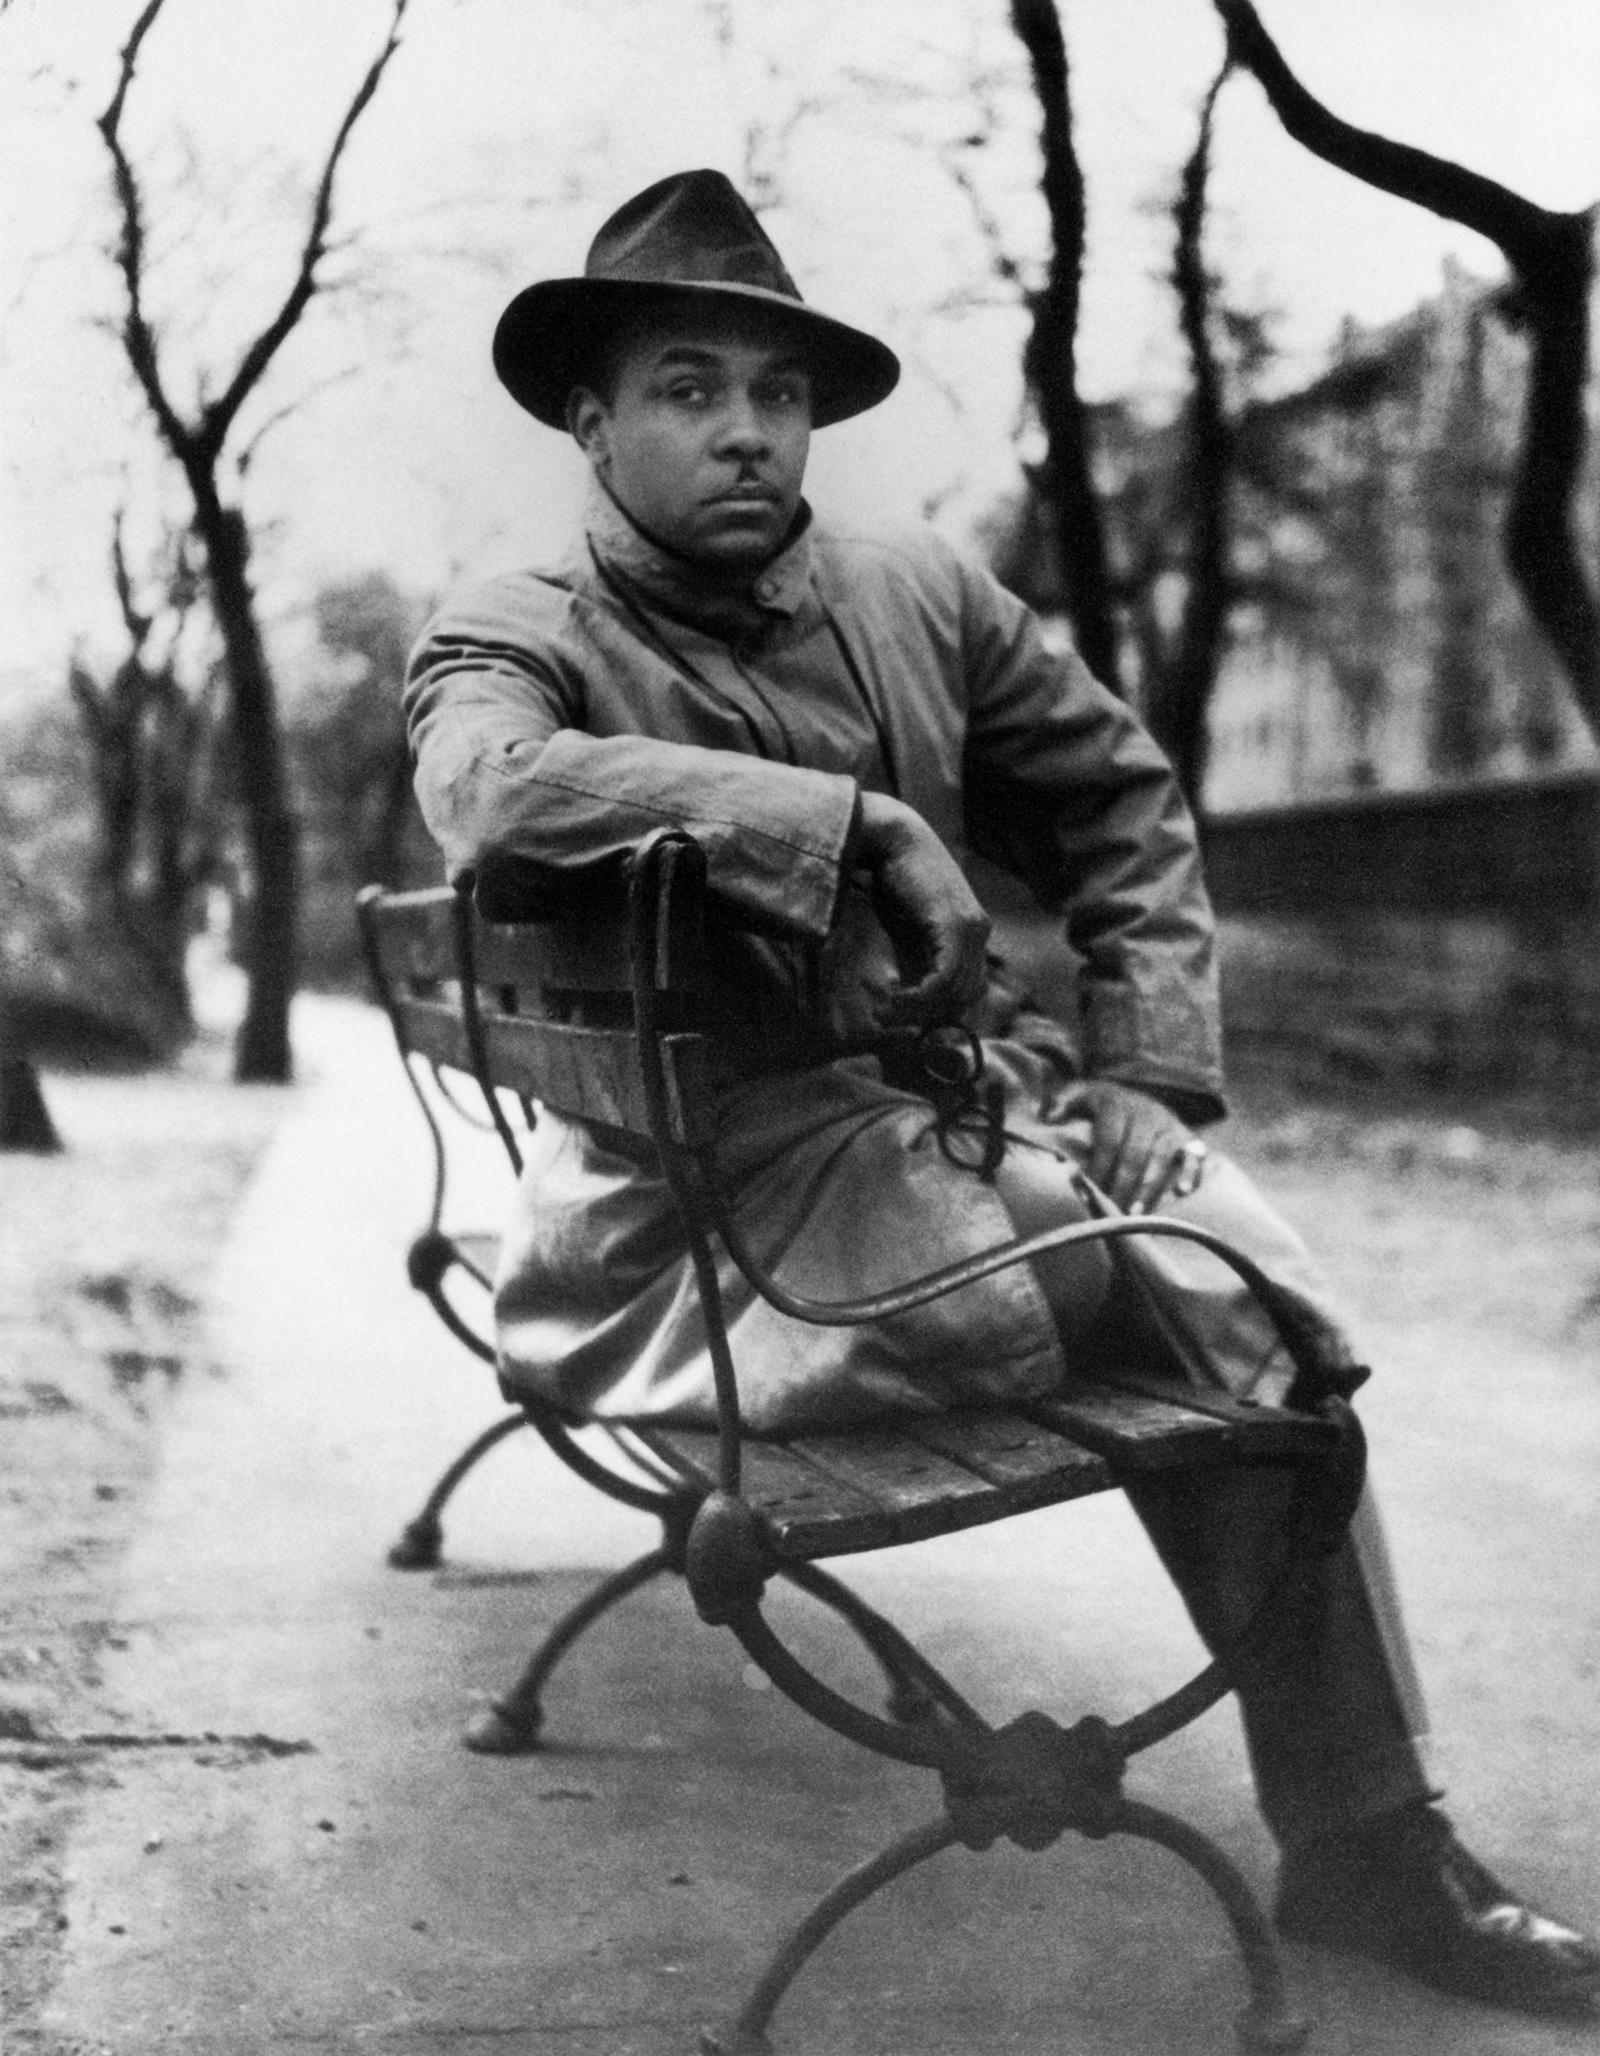 Ralph Ellison, Harlem, New York, 1947; photograph by Gordon Parks